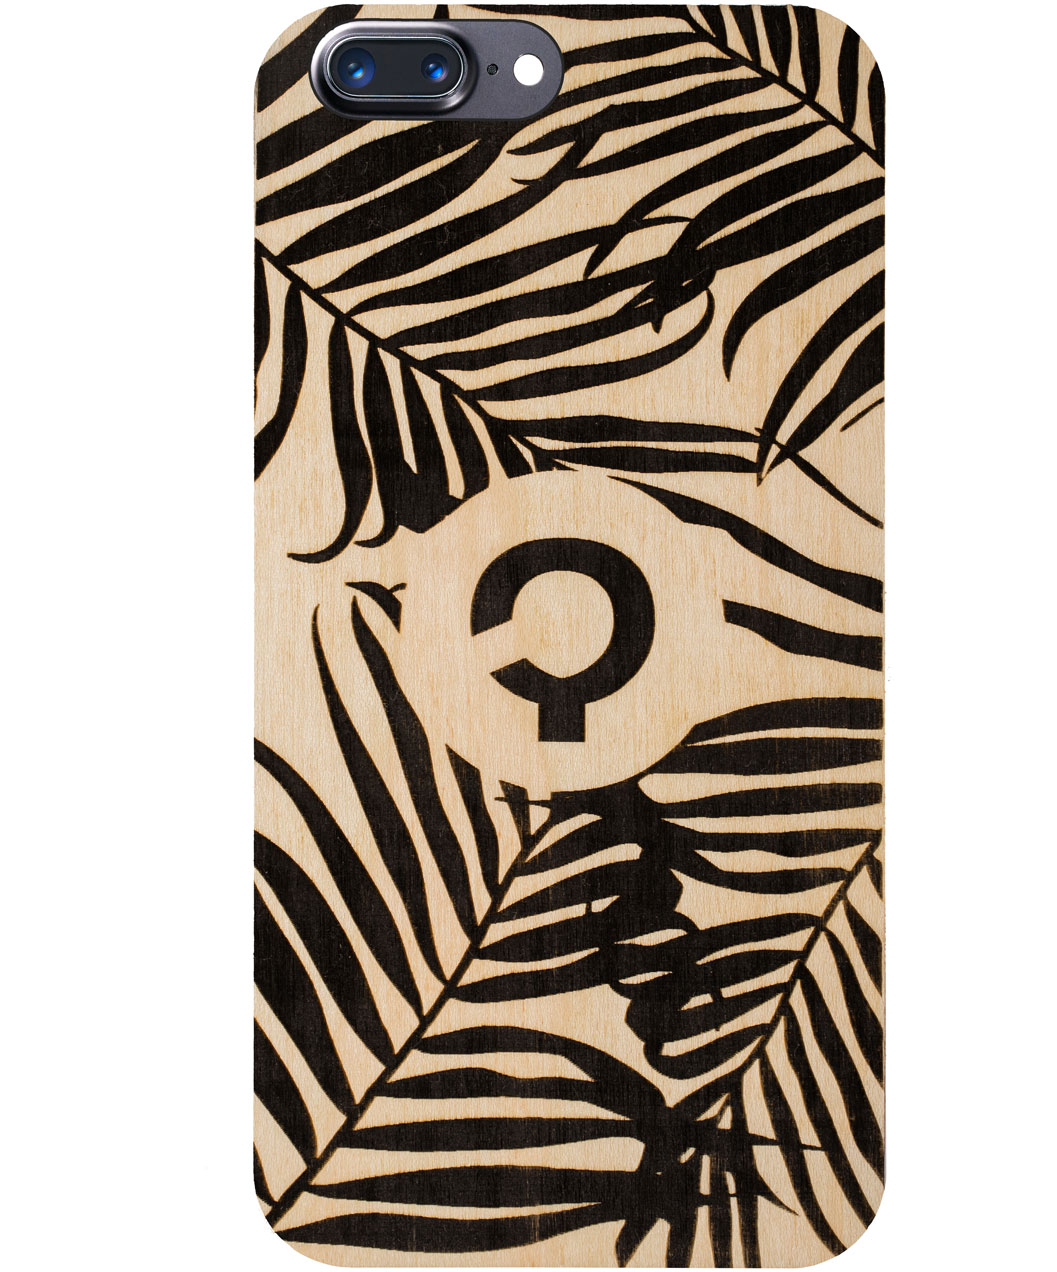 Wooden-case-iphone-7-plus-klon-Jungle